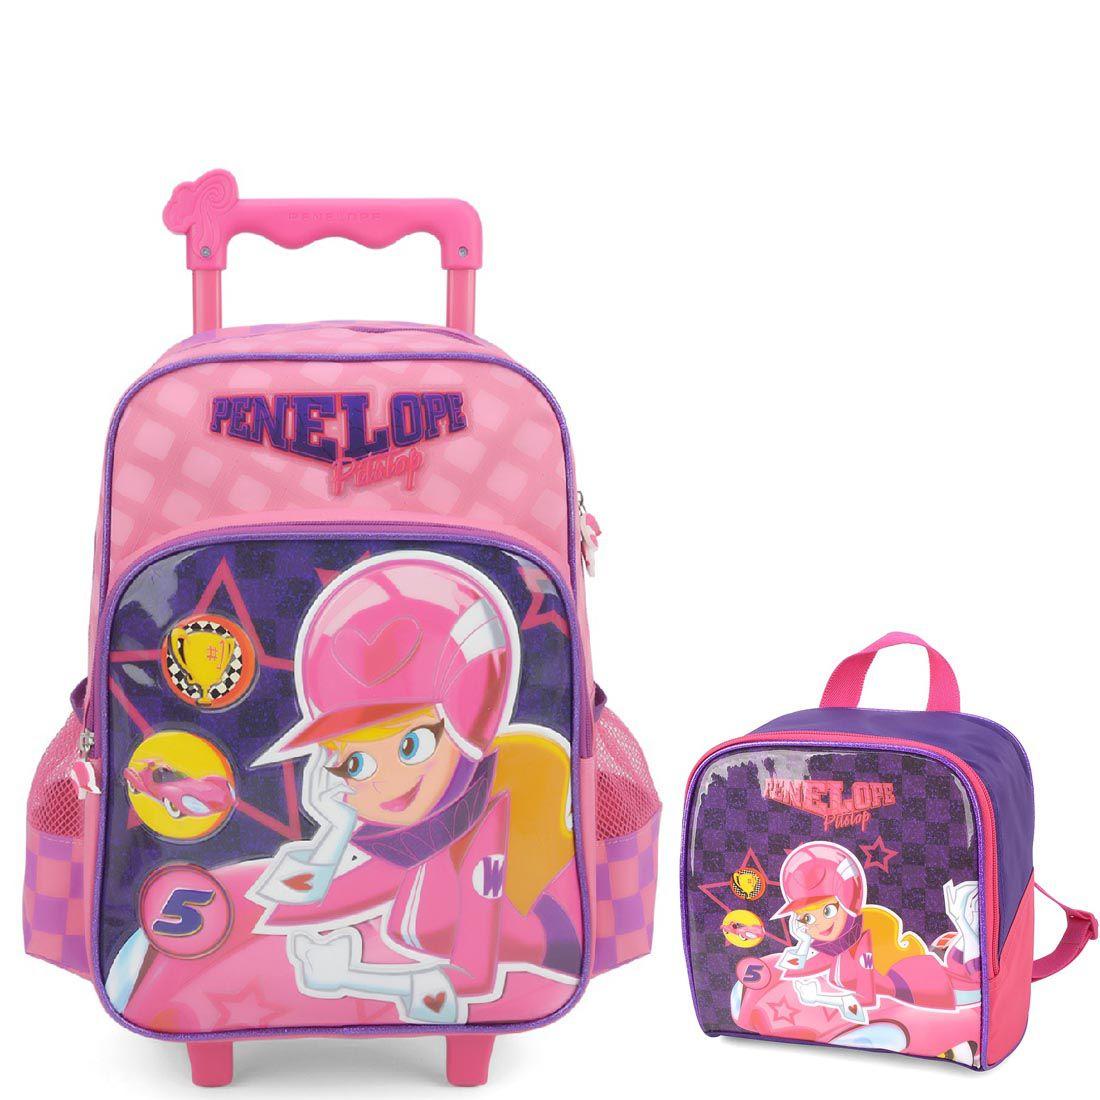 Kit Infantil Mochila de Rodinhas e Lancheira Penelope Pitstop Rosa